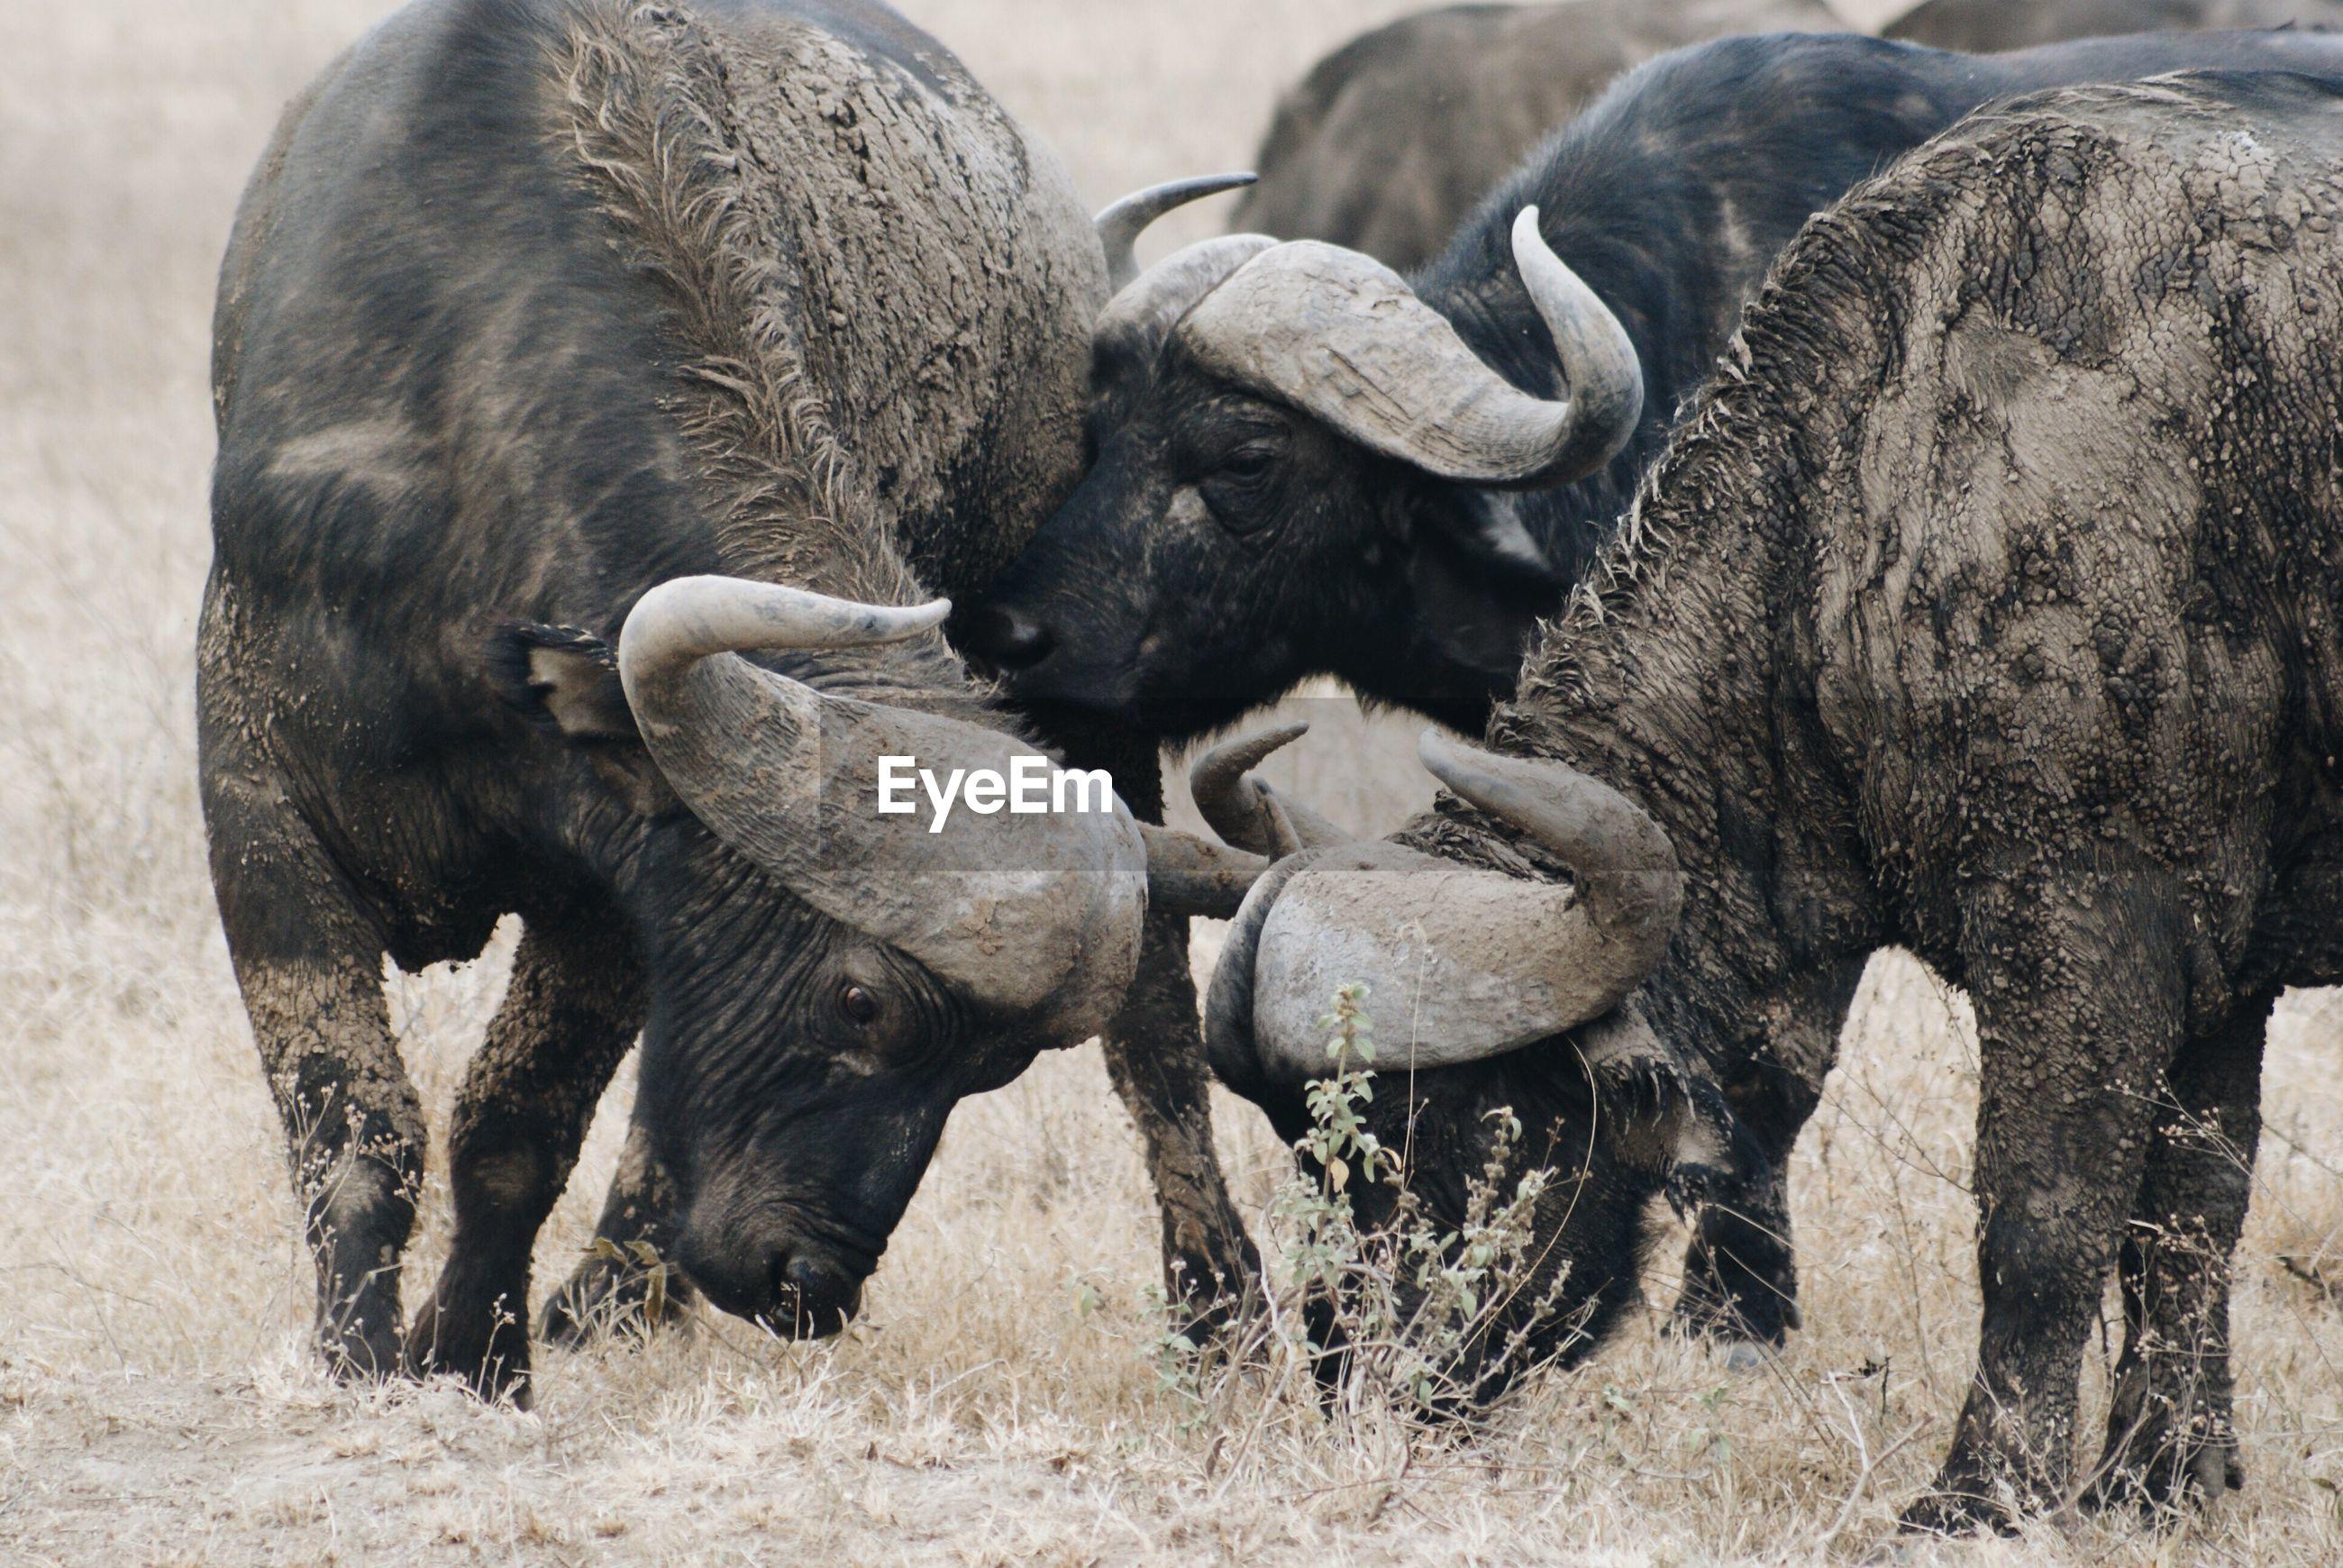 Buffaloes standing on land